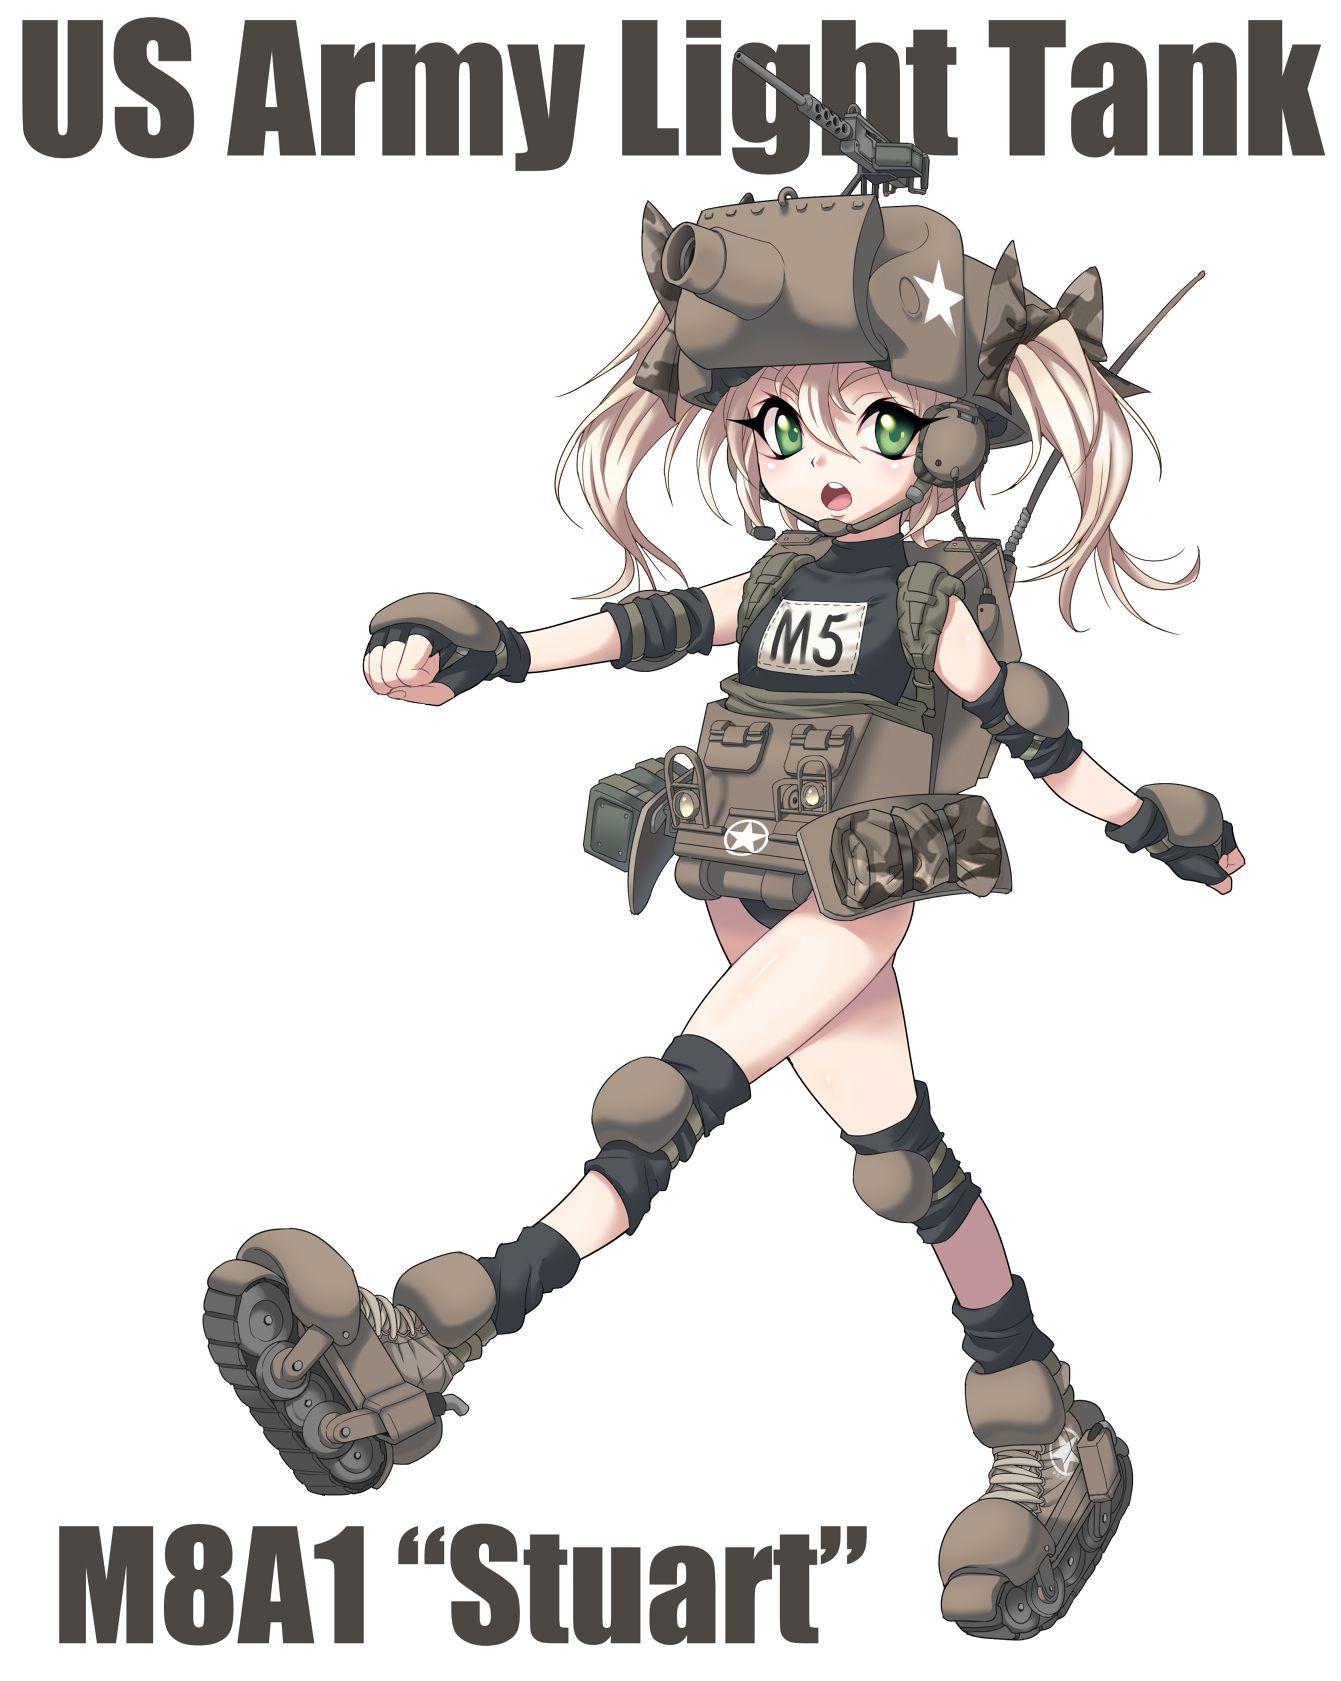 Mecha Musume Anime Tank Tank Girl Anime Military